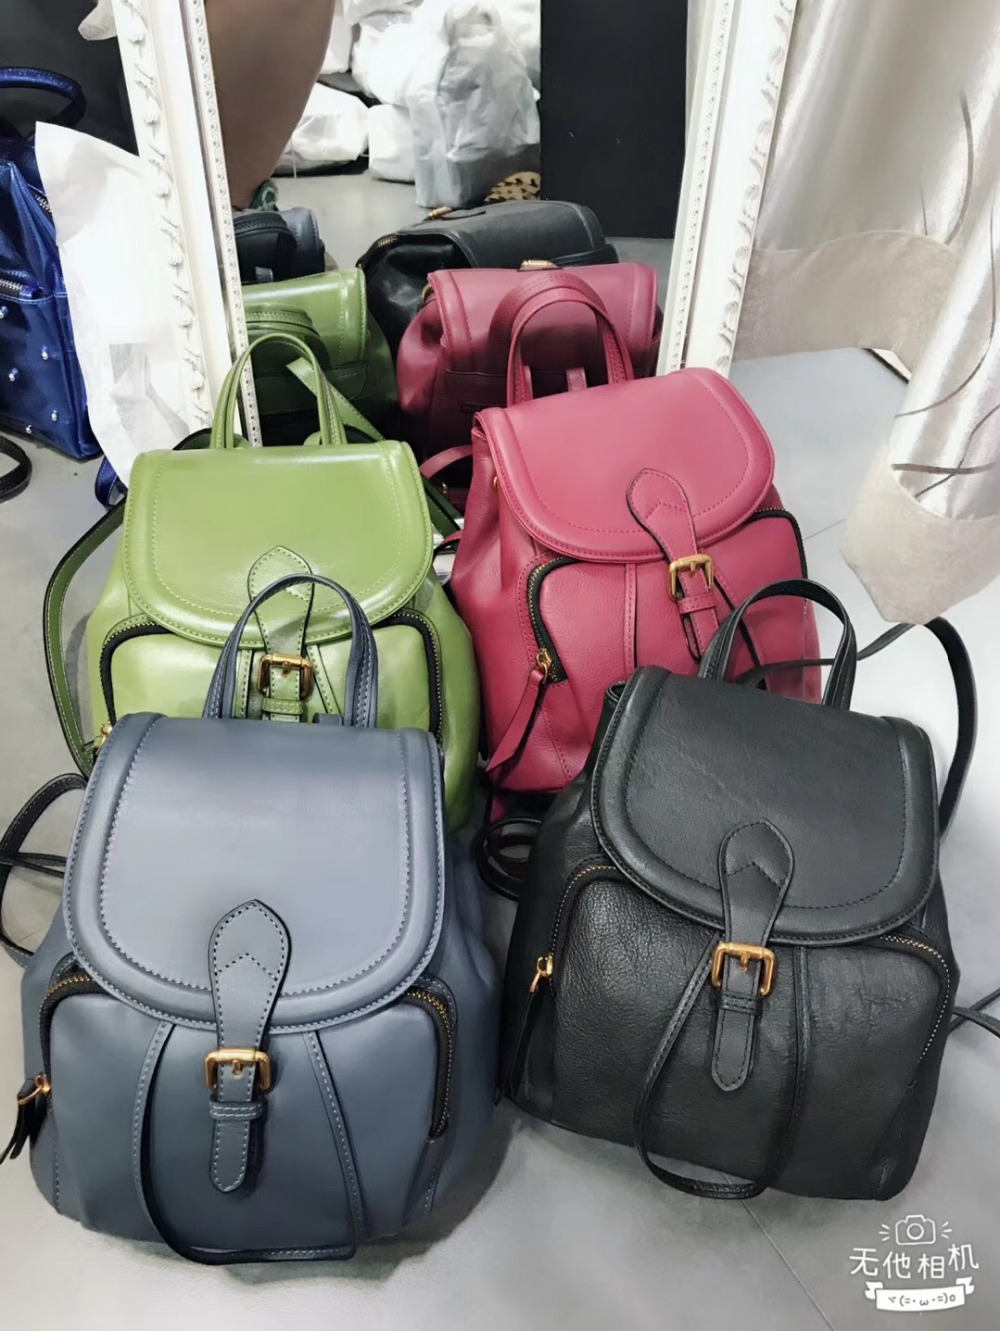 Kafunila 100% genuine leather women backpack luxury designer female shoulder bags fashion 2018 new backpack for women travel bag цена